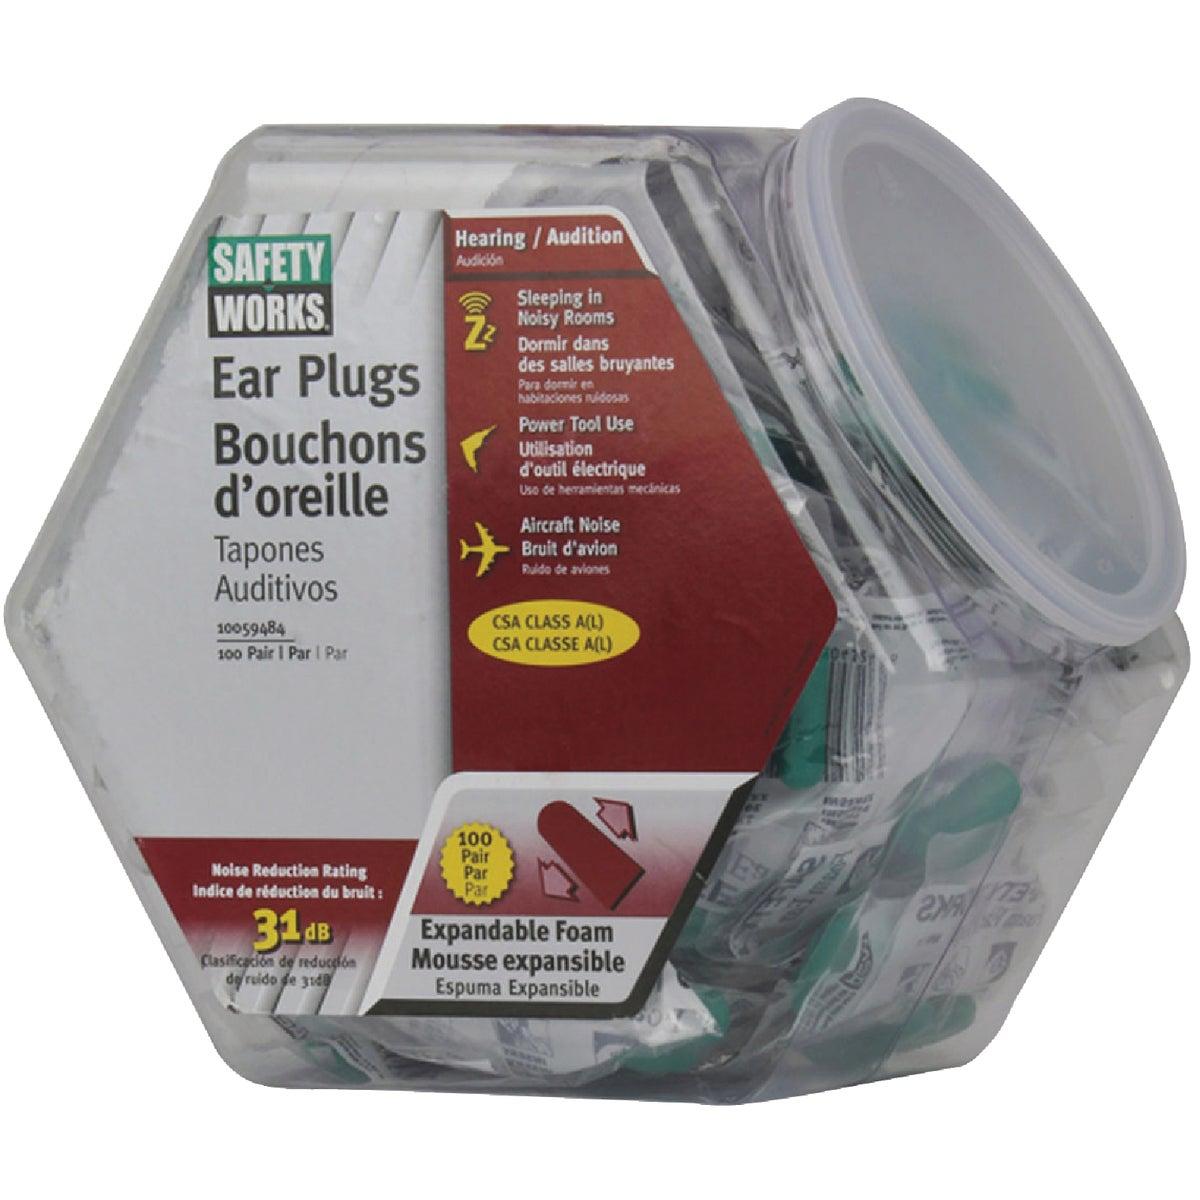 MSA Safety/InCom 100PR FOAM EARPLUGS 10059484